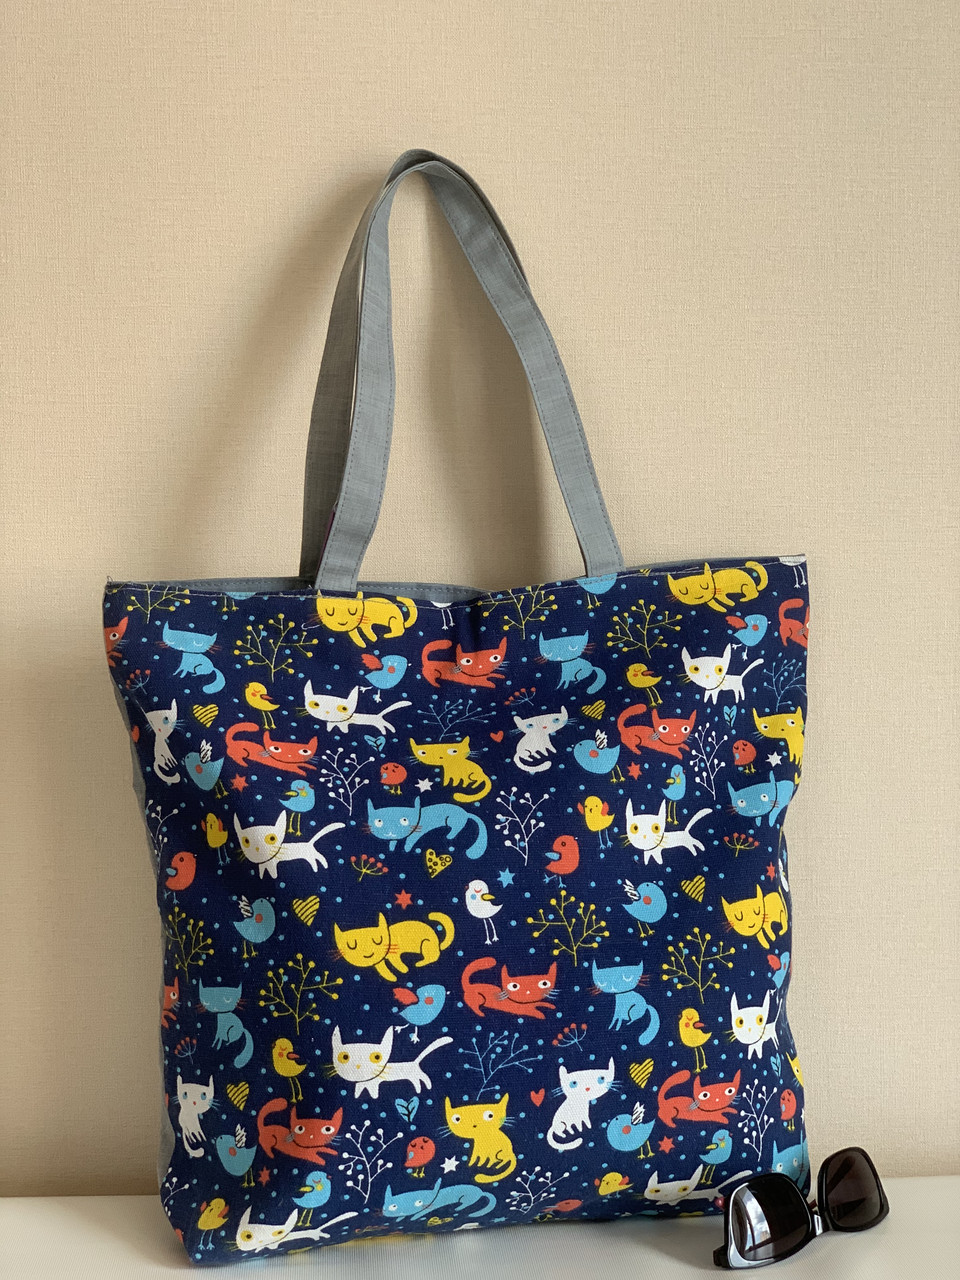 Пляжна еко сумка шоппер з тканини з котиками